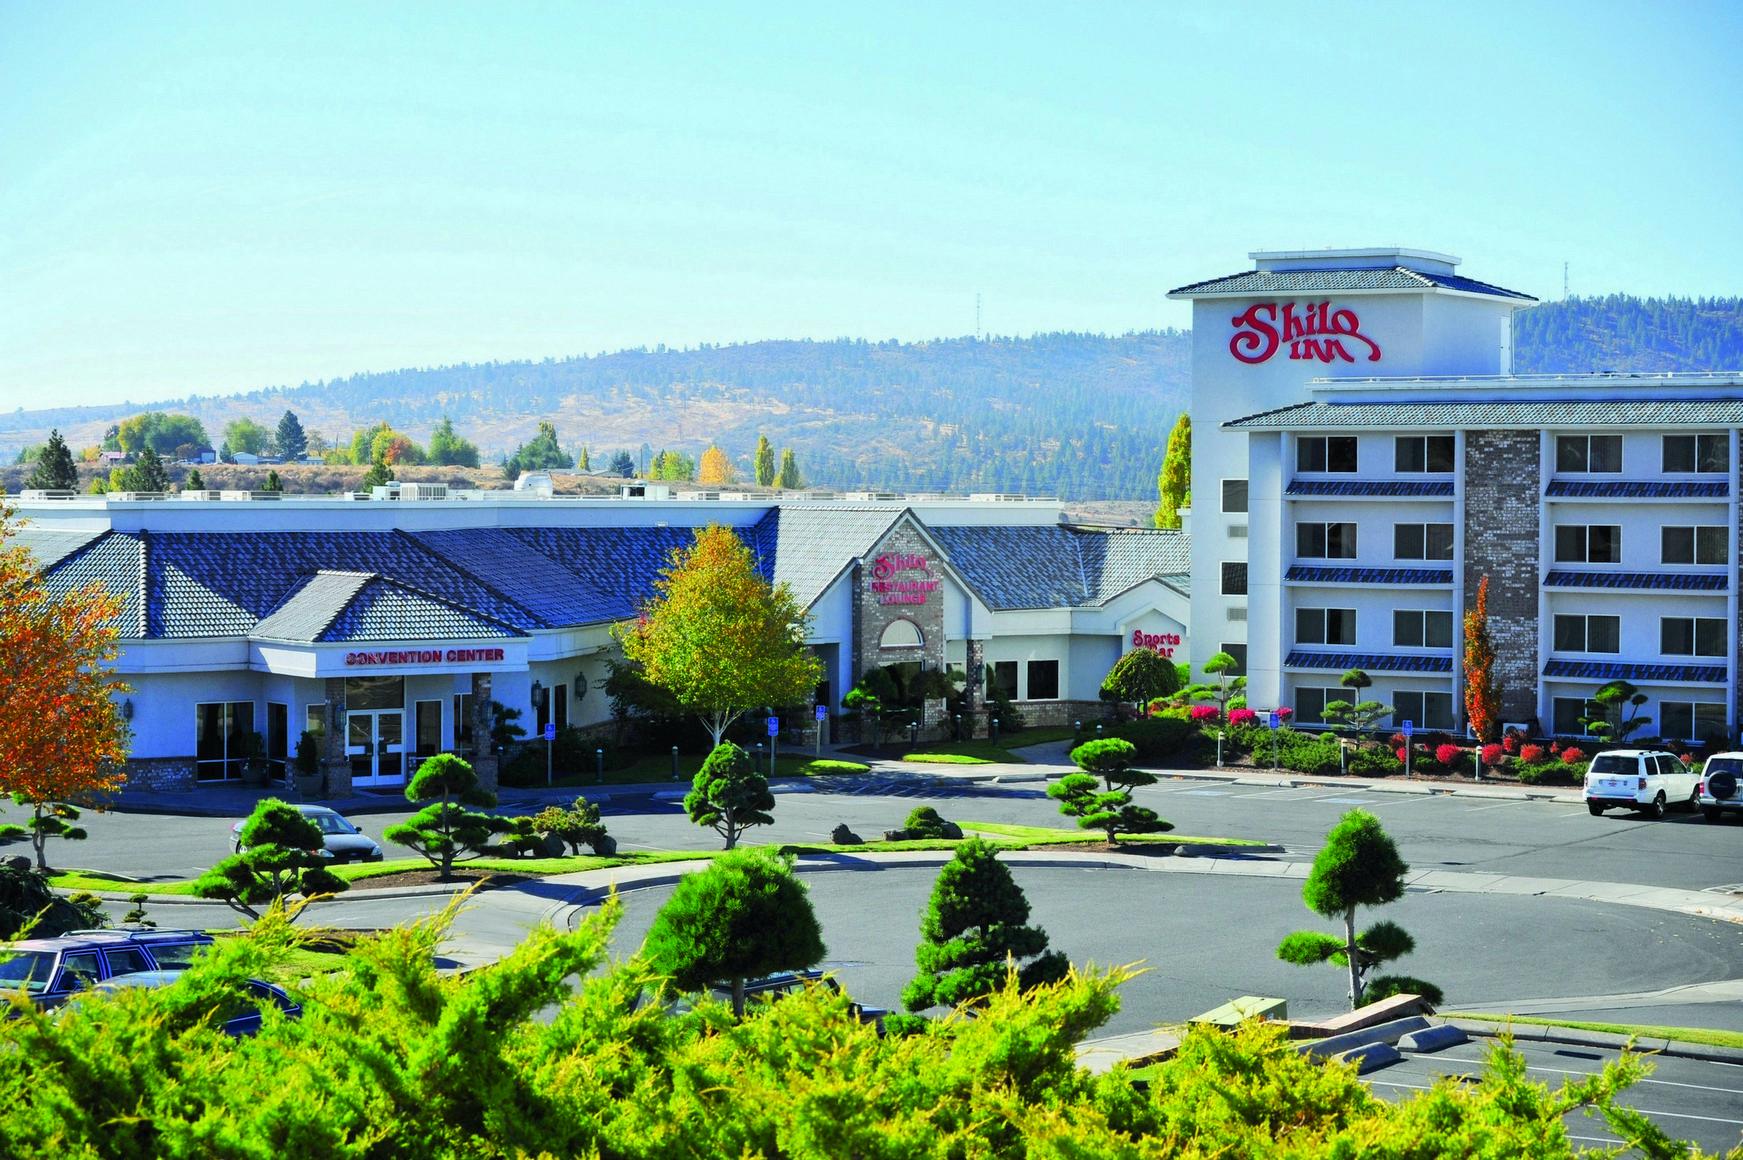 Shilo Inns Suites Hotels Klamath Falls Oregon